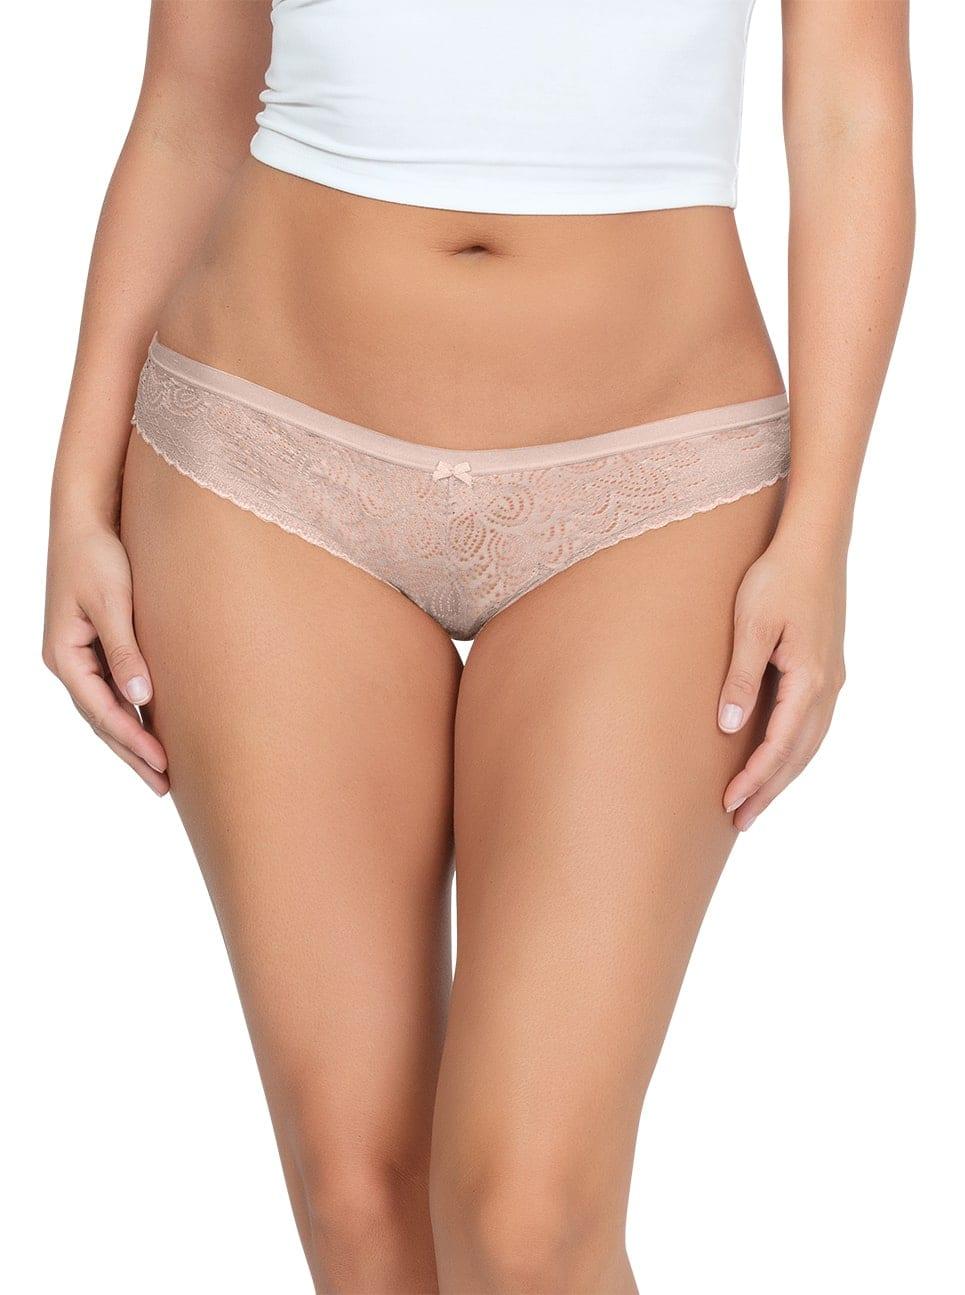 ParfaitPanty SoGlam BikiniPP302 Bare Front copy - Panty So Glam Bikini - Bare - PP302